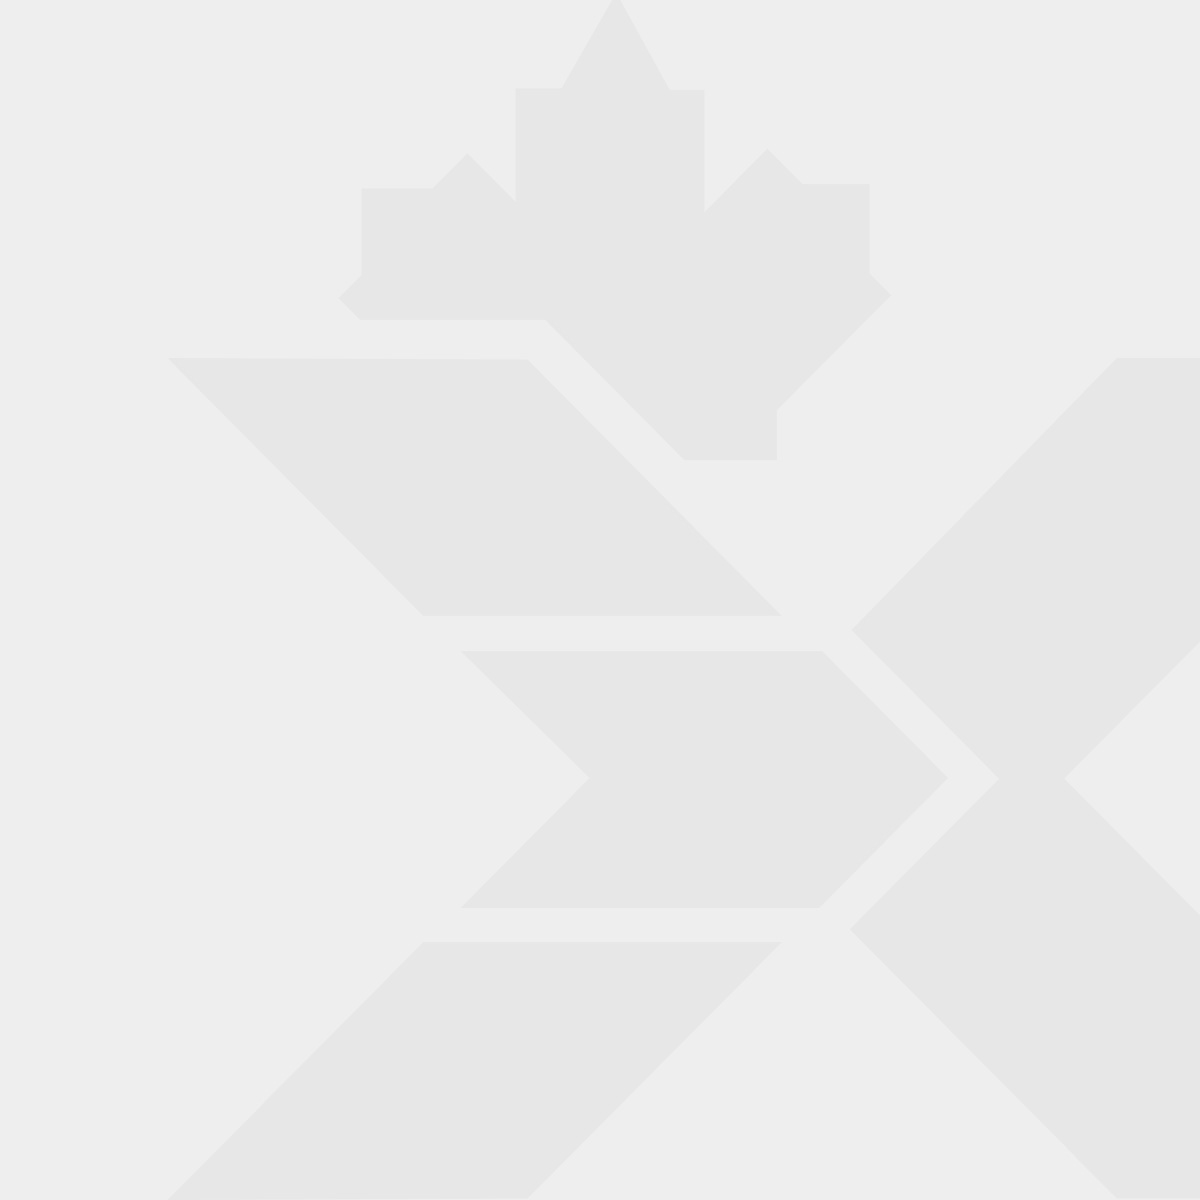 ROYAL CANADIAN NAVY - Velcro Sleeve Patch